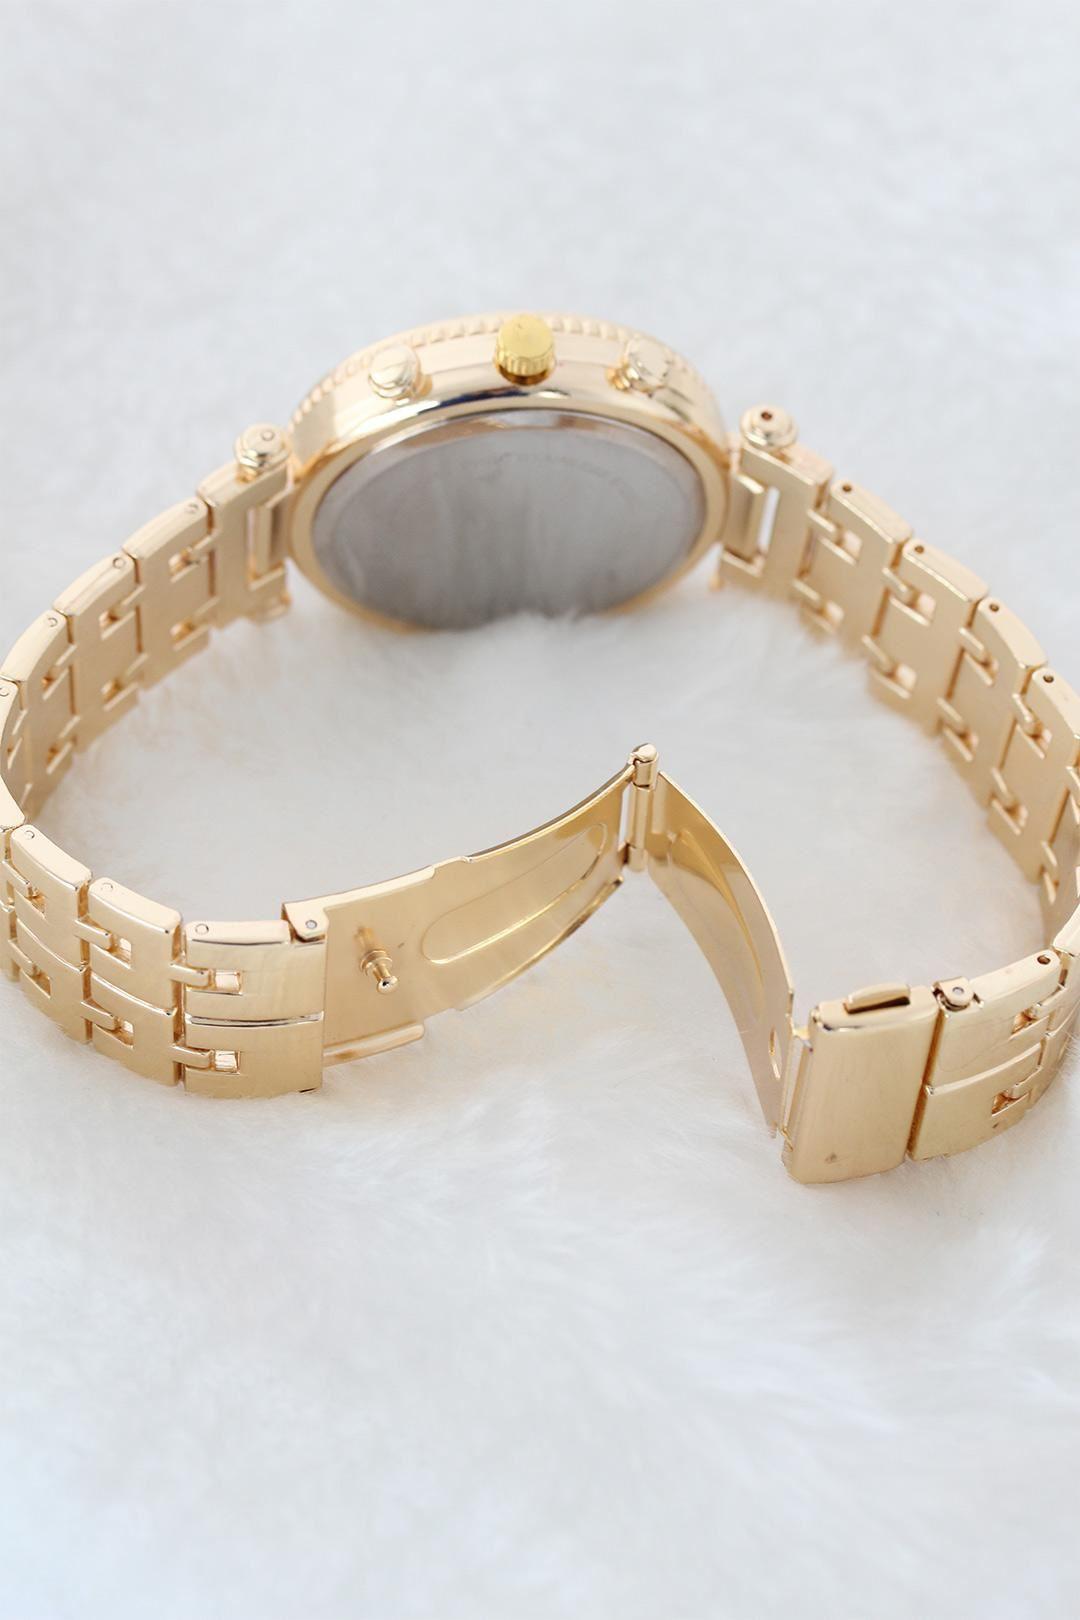 Taşlı Kasa Gold Renk Metal Kordonlu Bayan Kol Saati